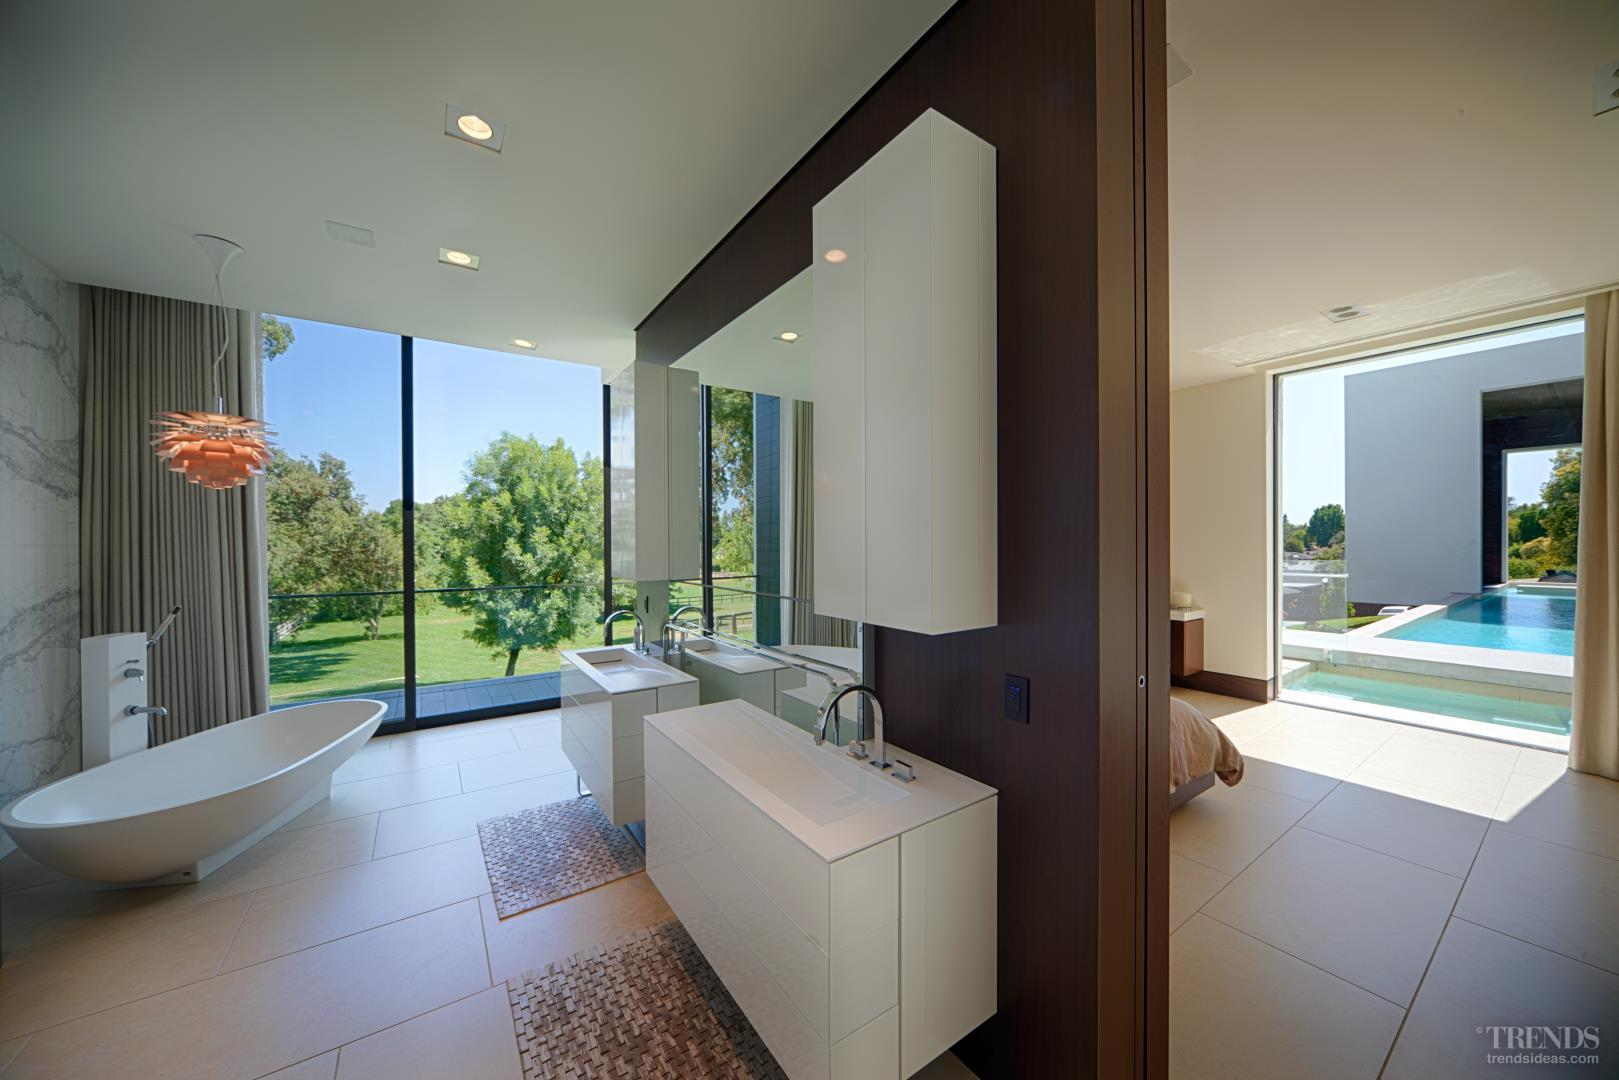 Open Plan Master Suite With Freestanding Bathtub Sapele Wood Wall Pocket Doors